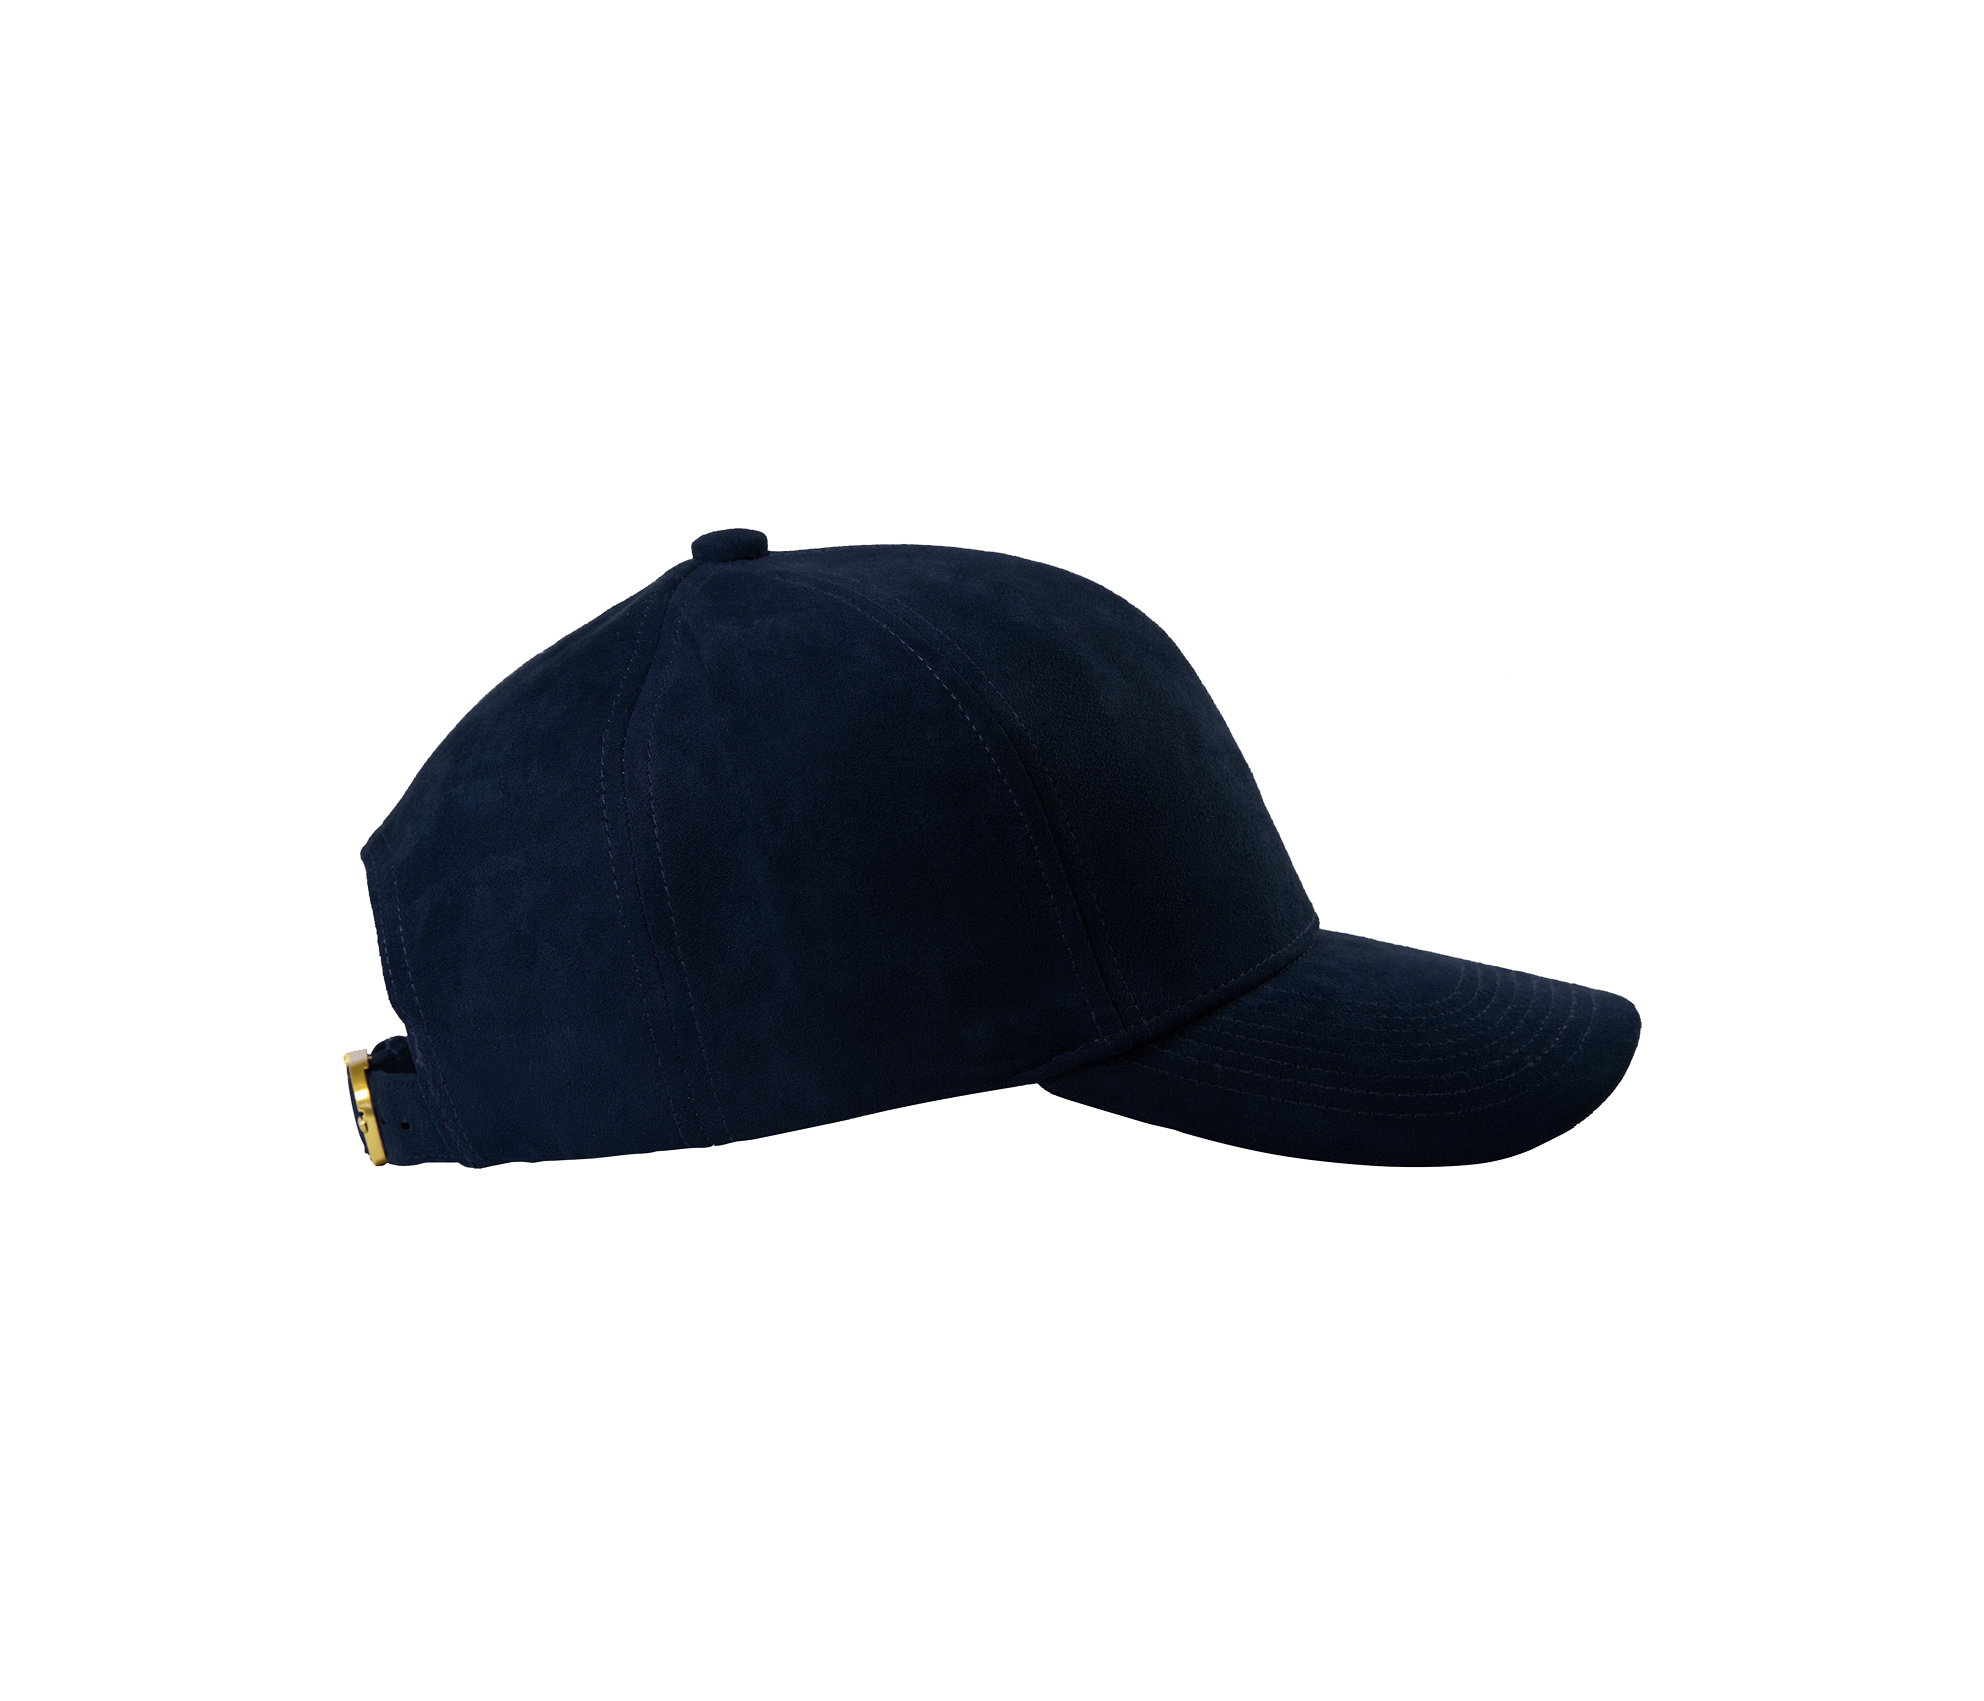 DSLINE BASEBALL CAP NAVY BLUE SUEDE   GOLD - DSLINE BASICS 4c99bc6fabd